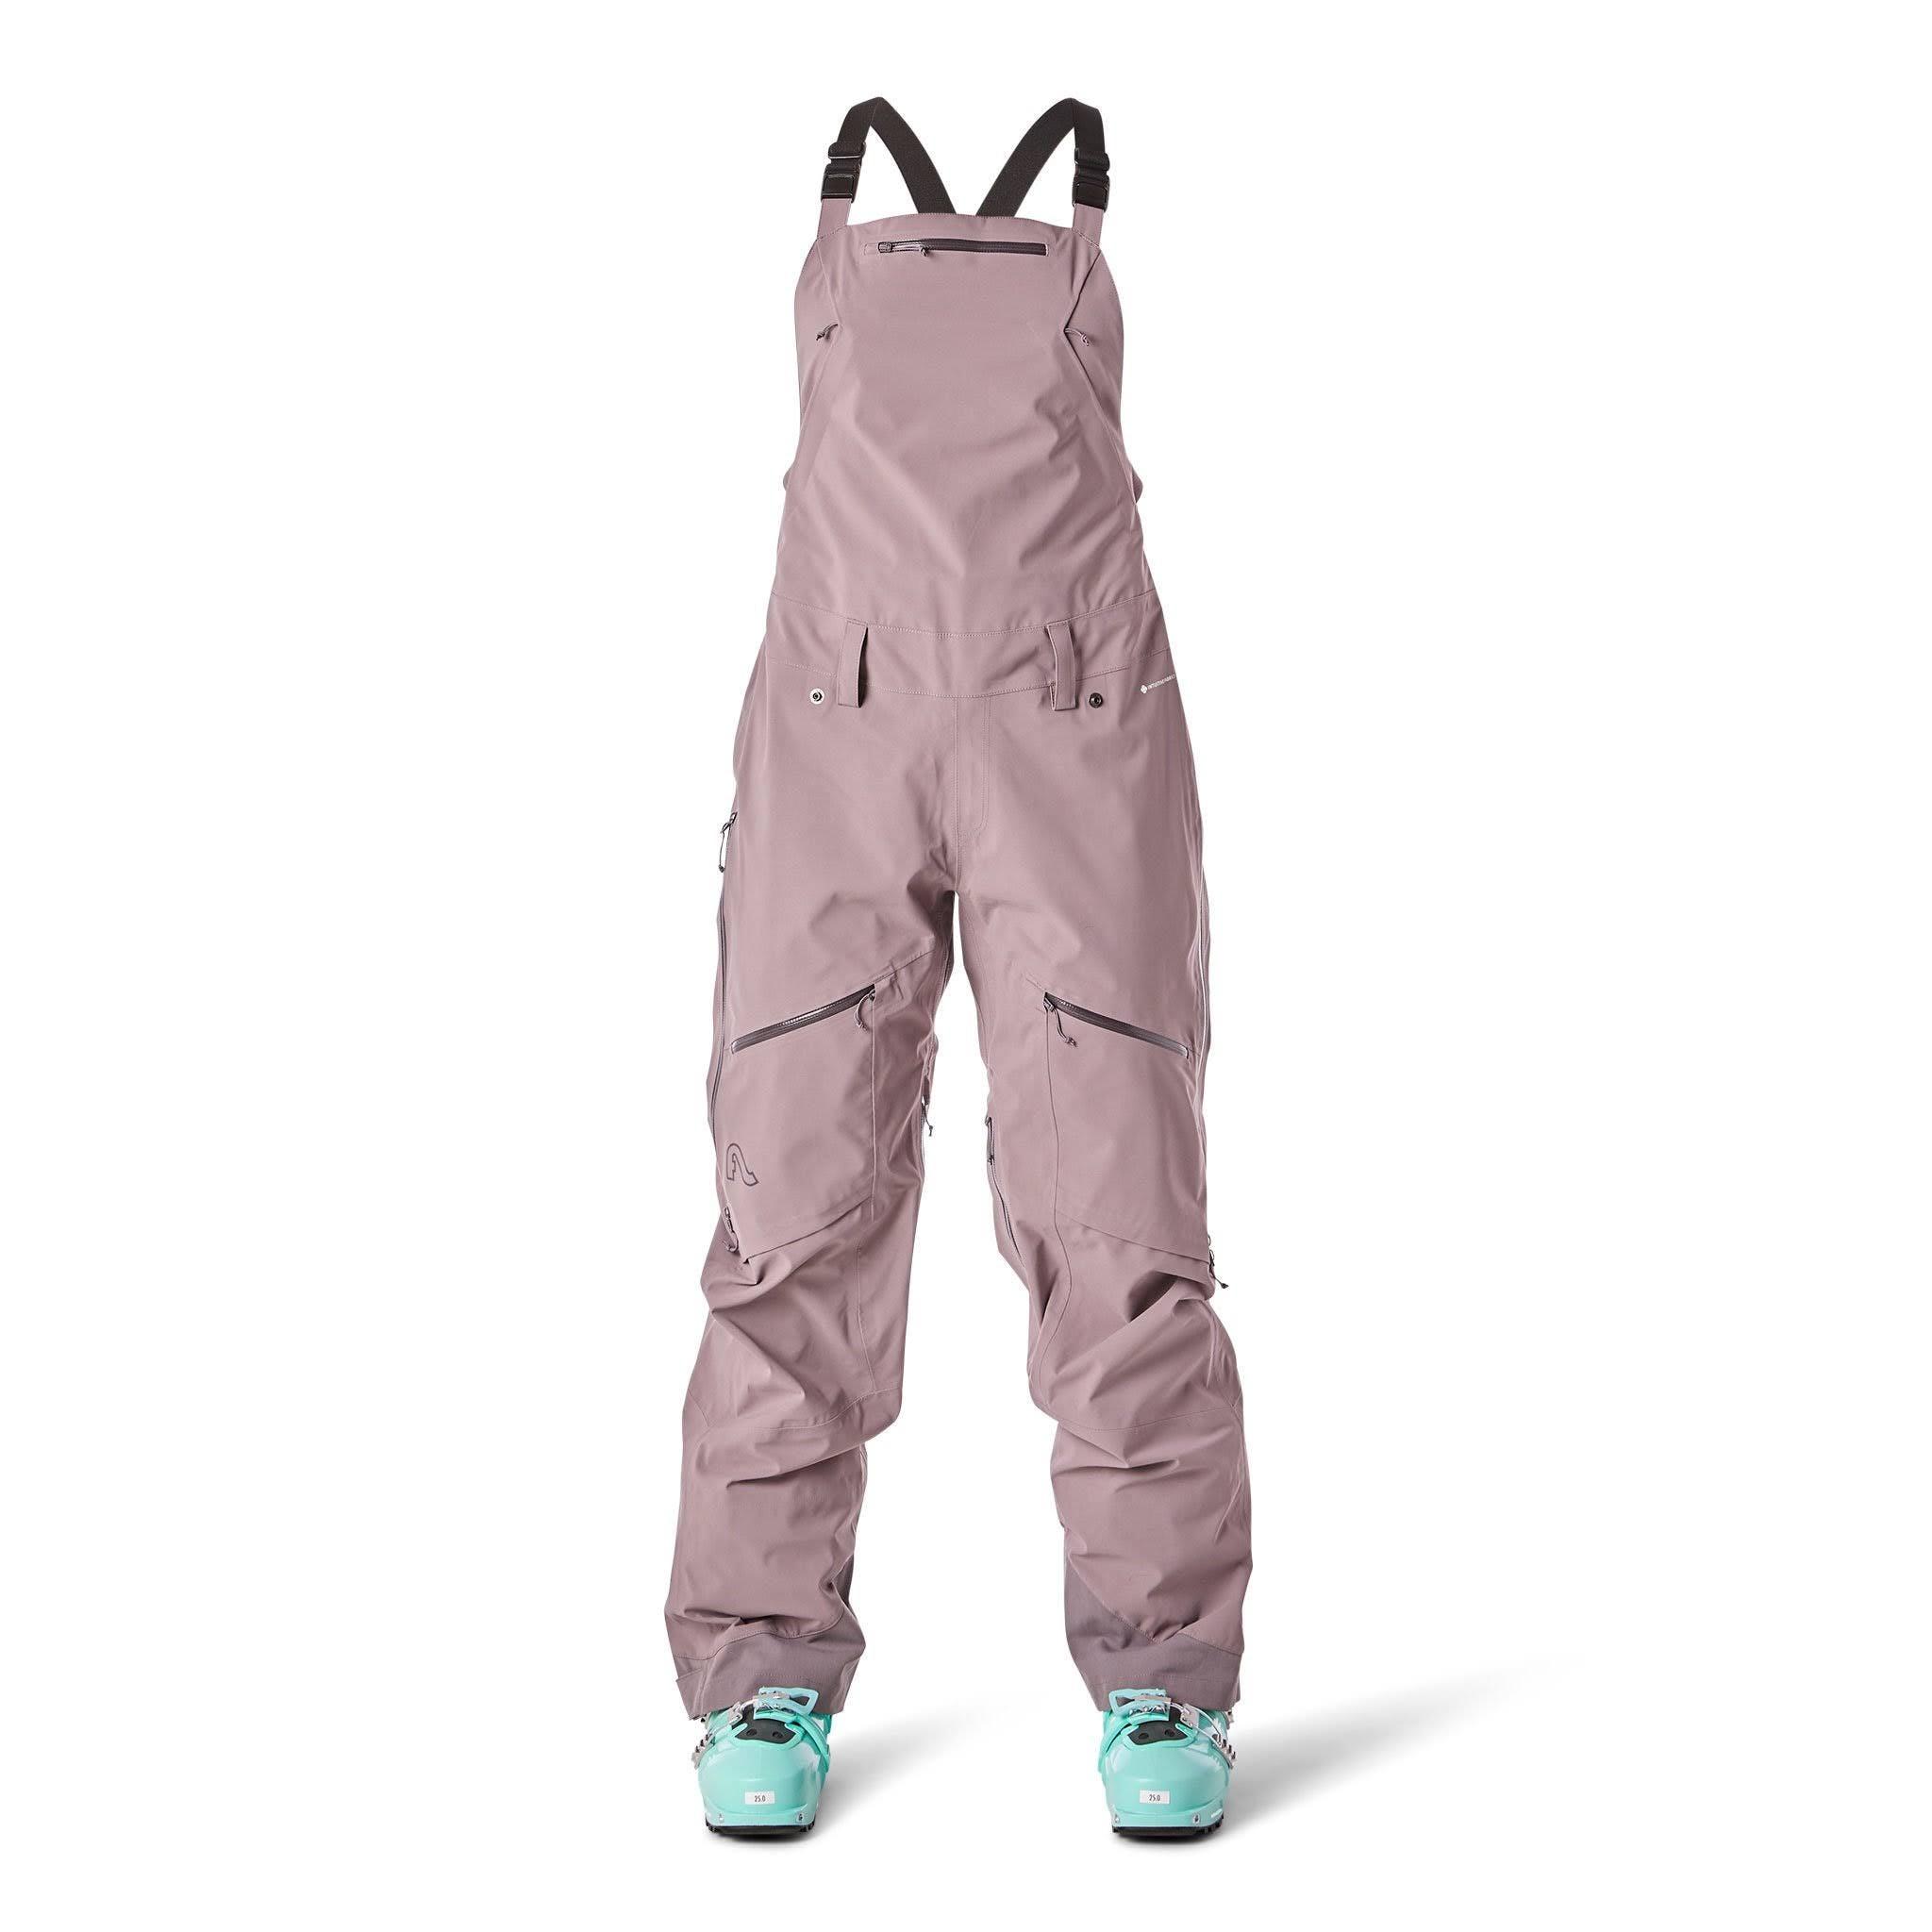 Flylow Foxy Bib Women's Shark / M Pants